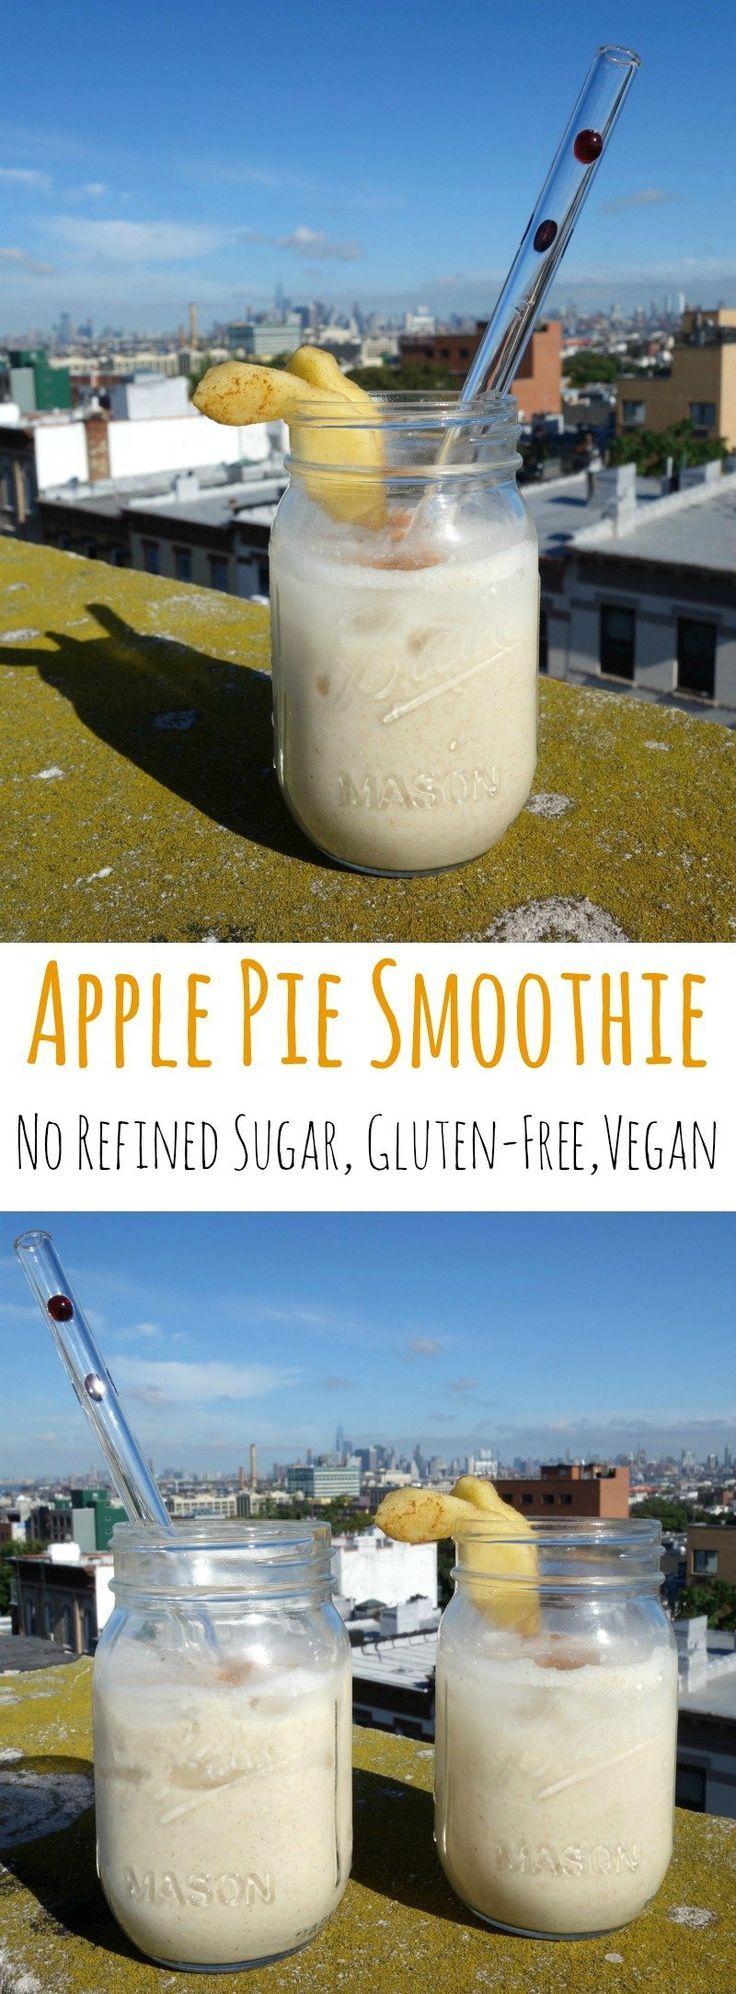 Apple Cinnamon Smoothie aka Healthy Apple Pie Smoothie - no refined sugar, gluten-free, vegan | curlsnchard.com